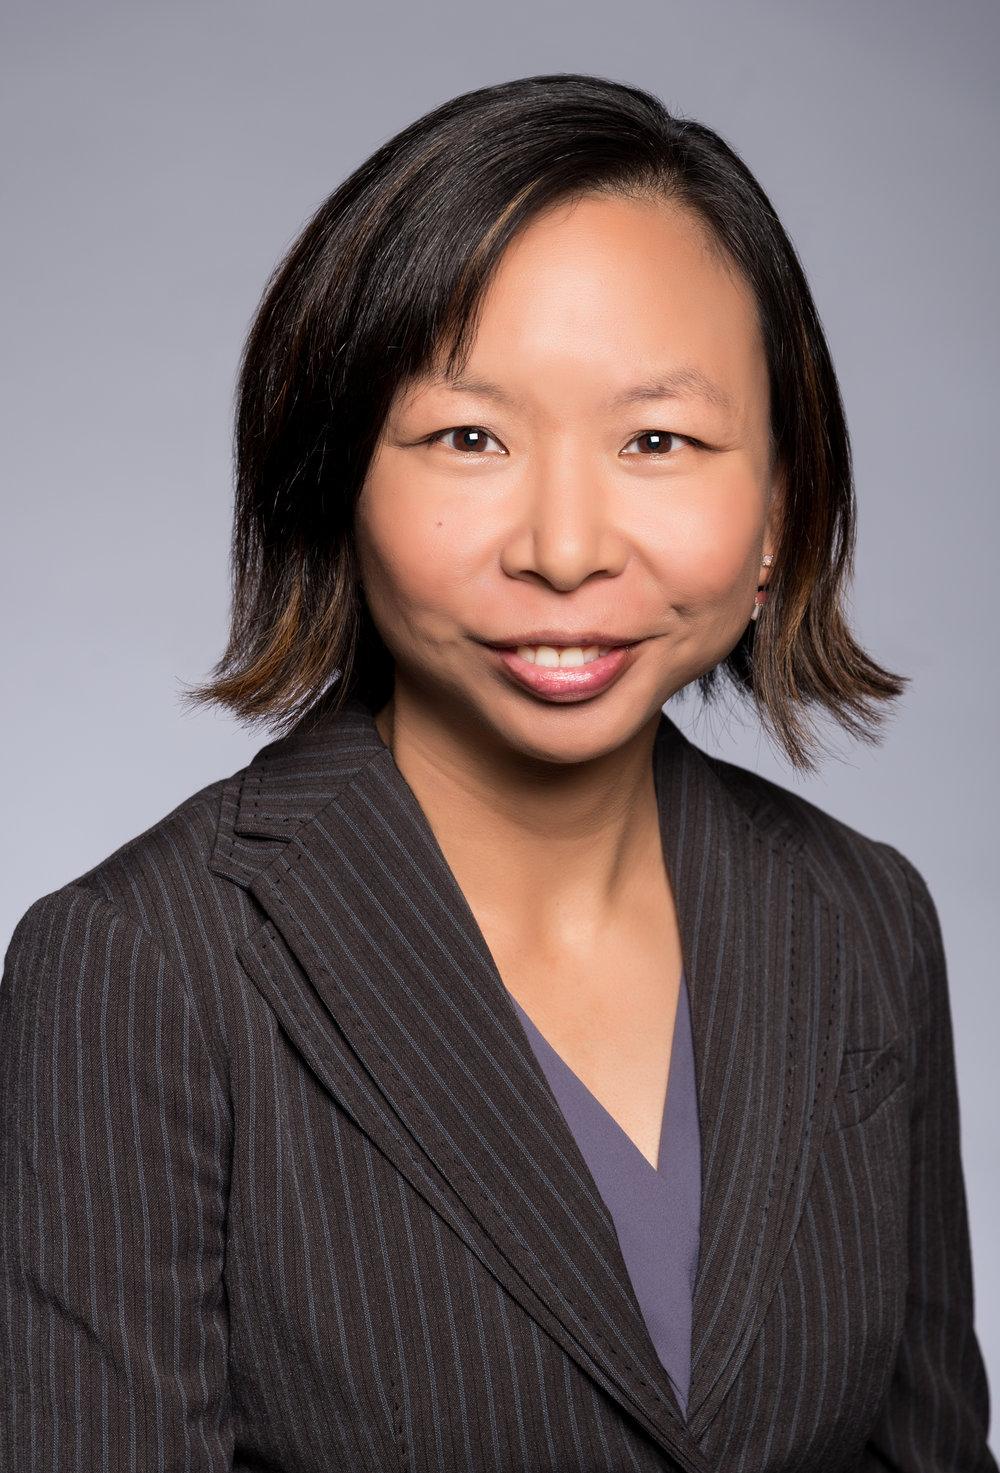 Angeline Liu